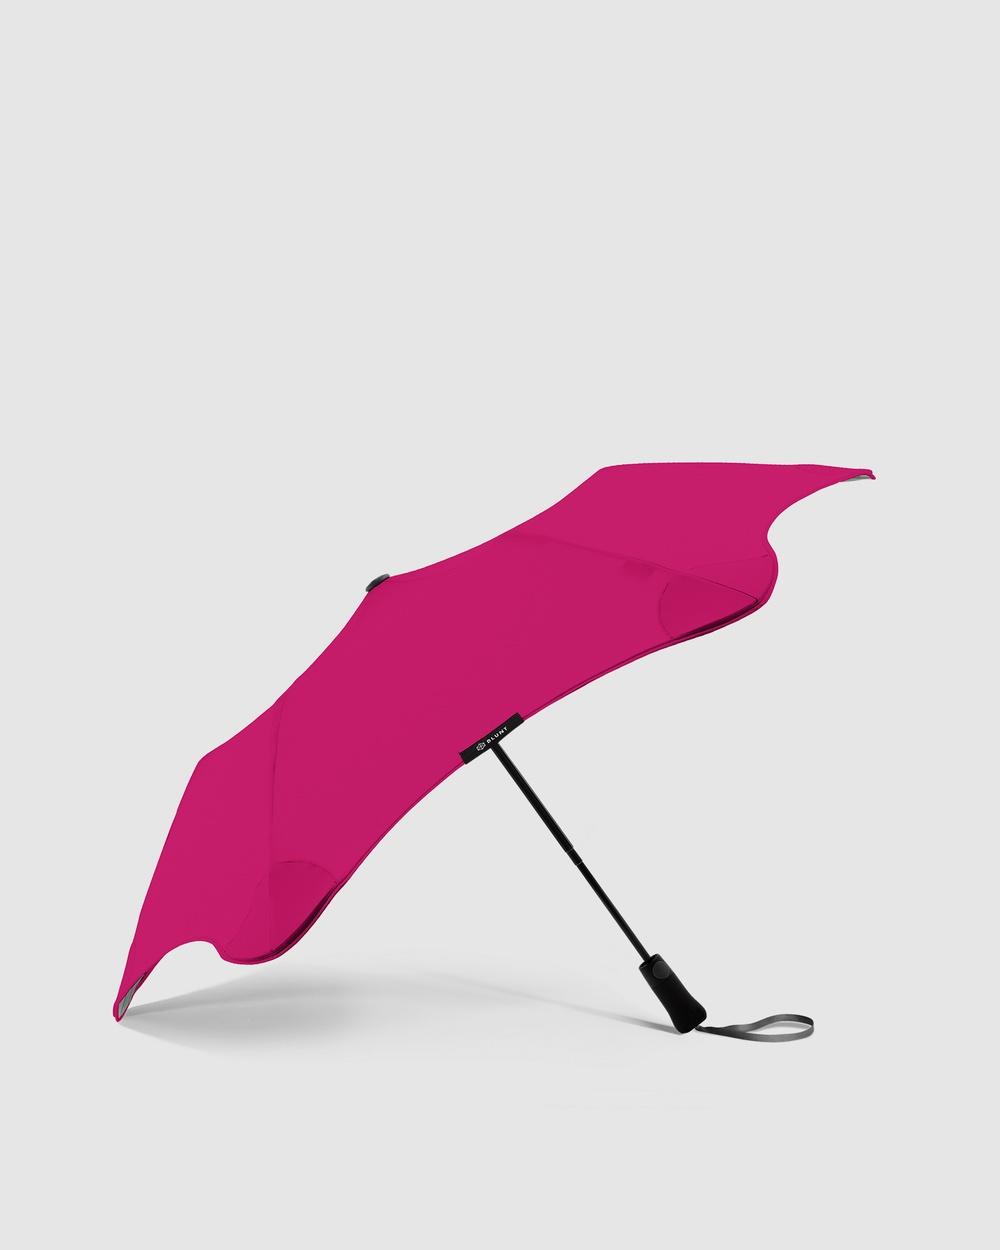 BLUNT Umbrellas Blunt Metro Umbrella Accessories Pink